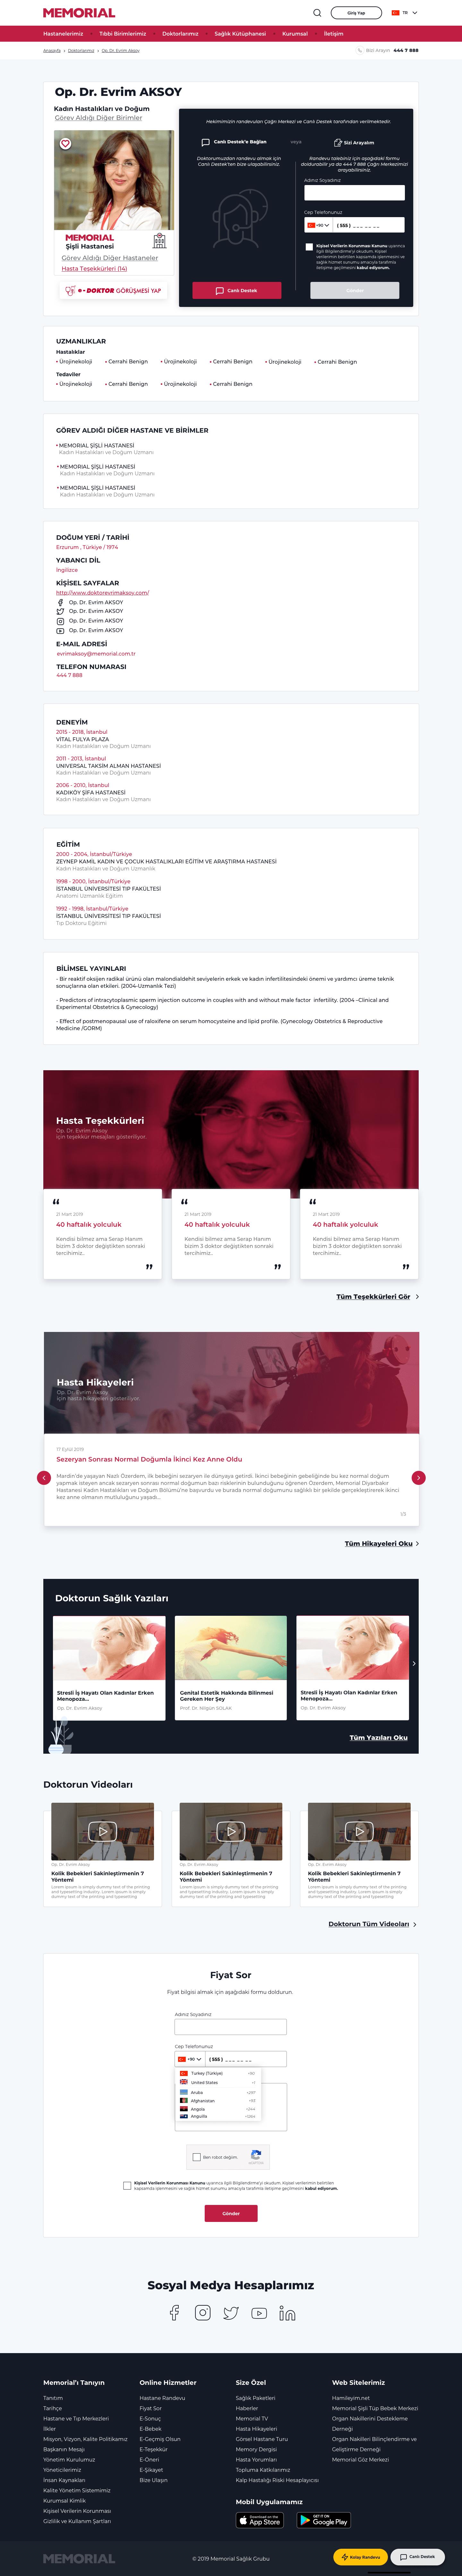 memorial website mockup